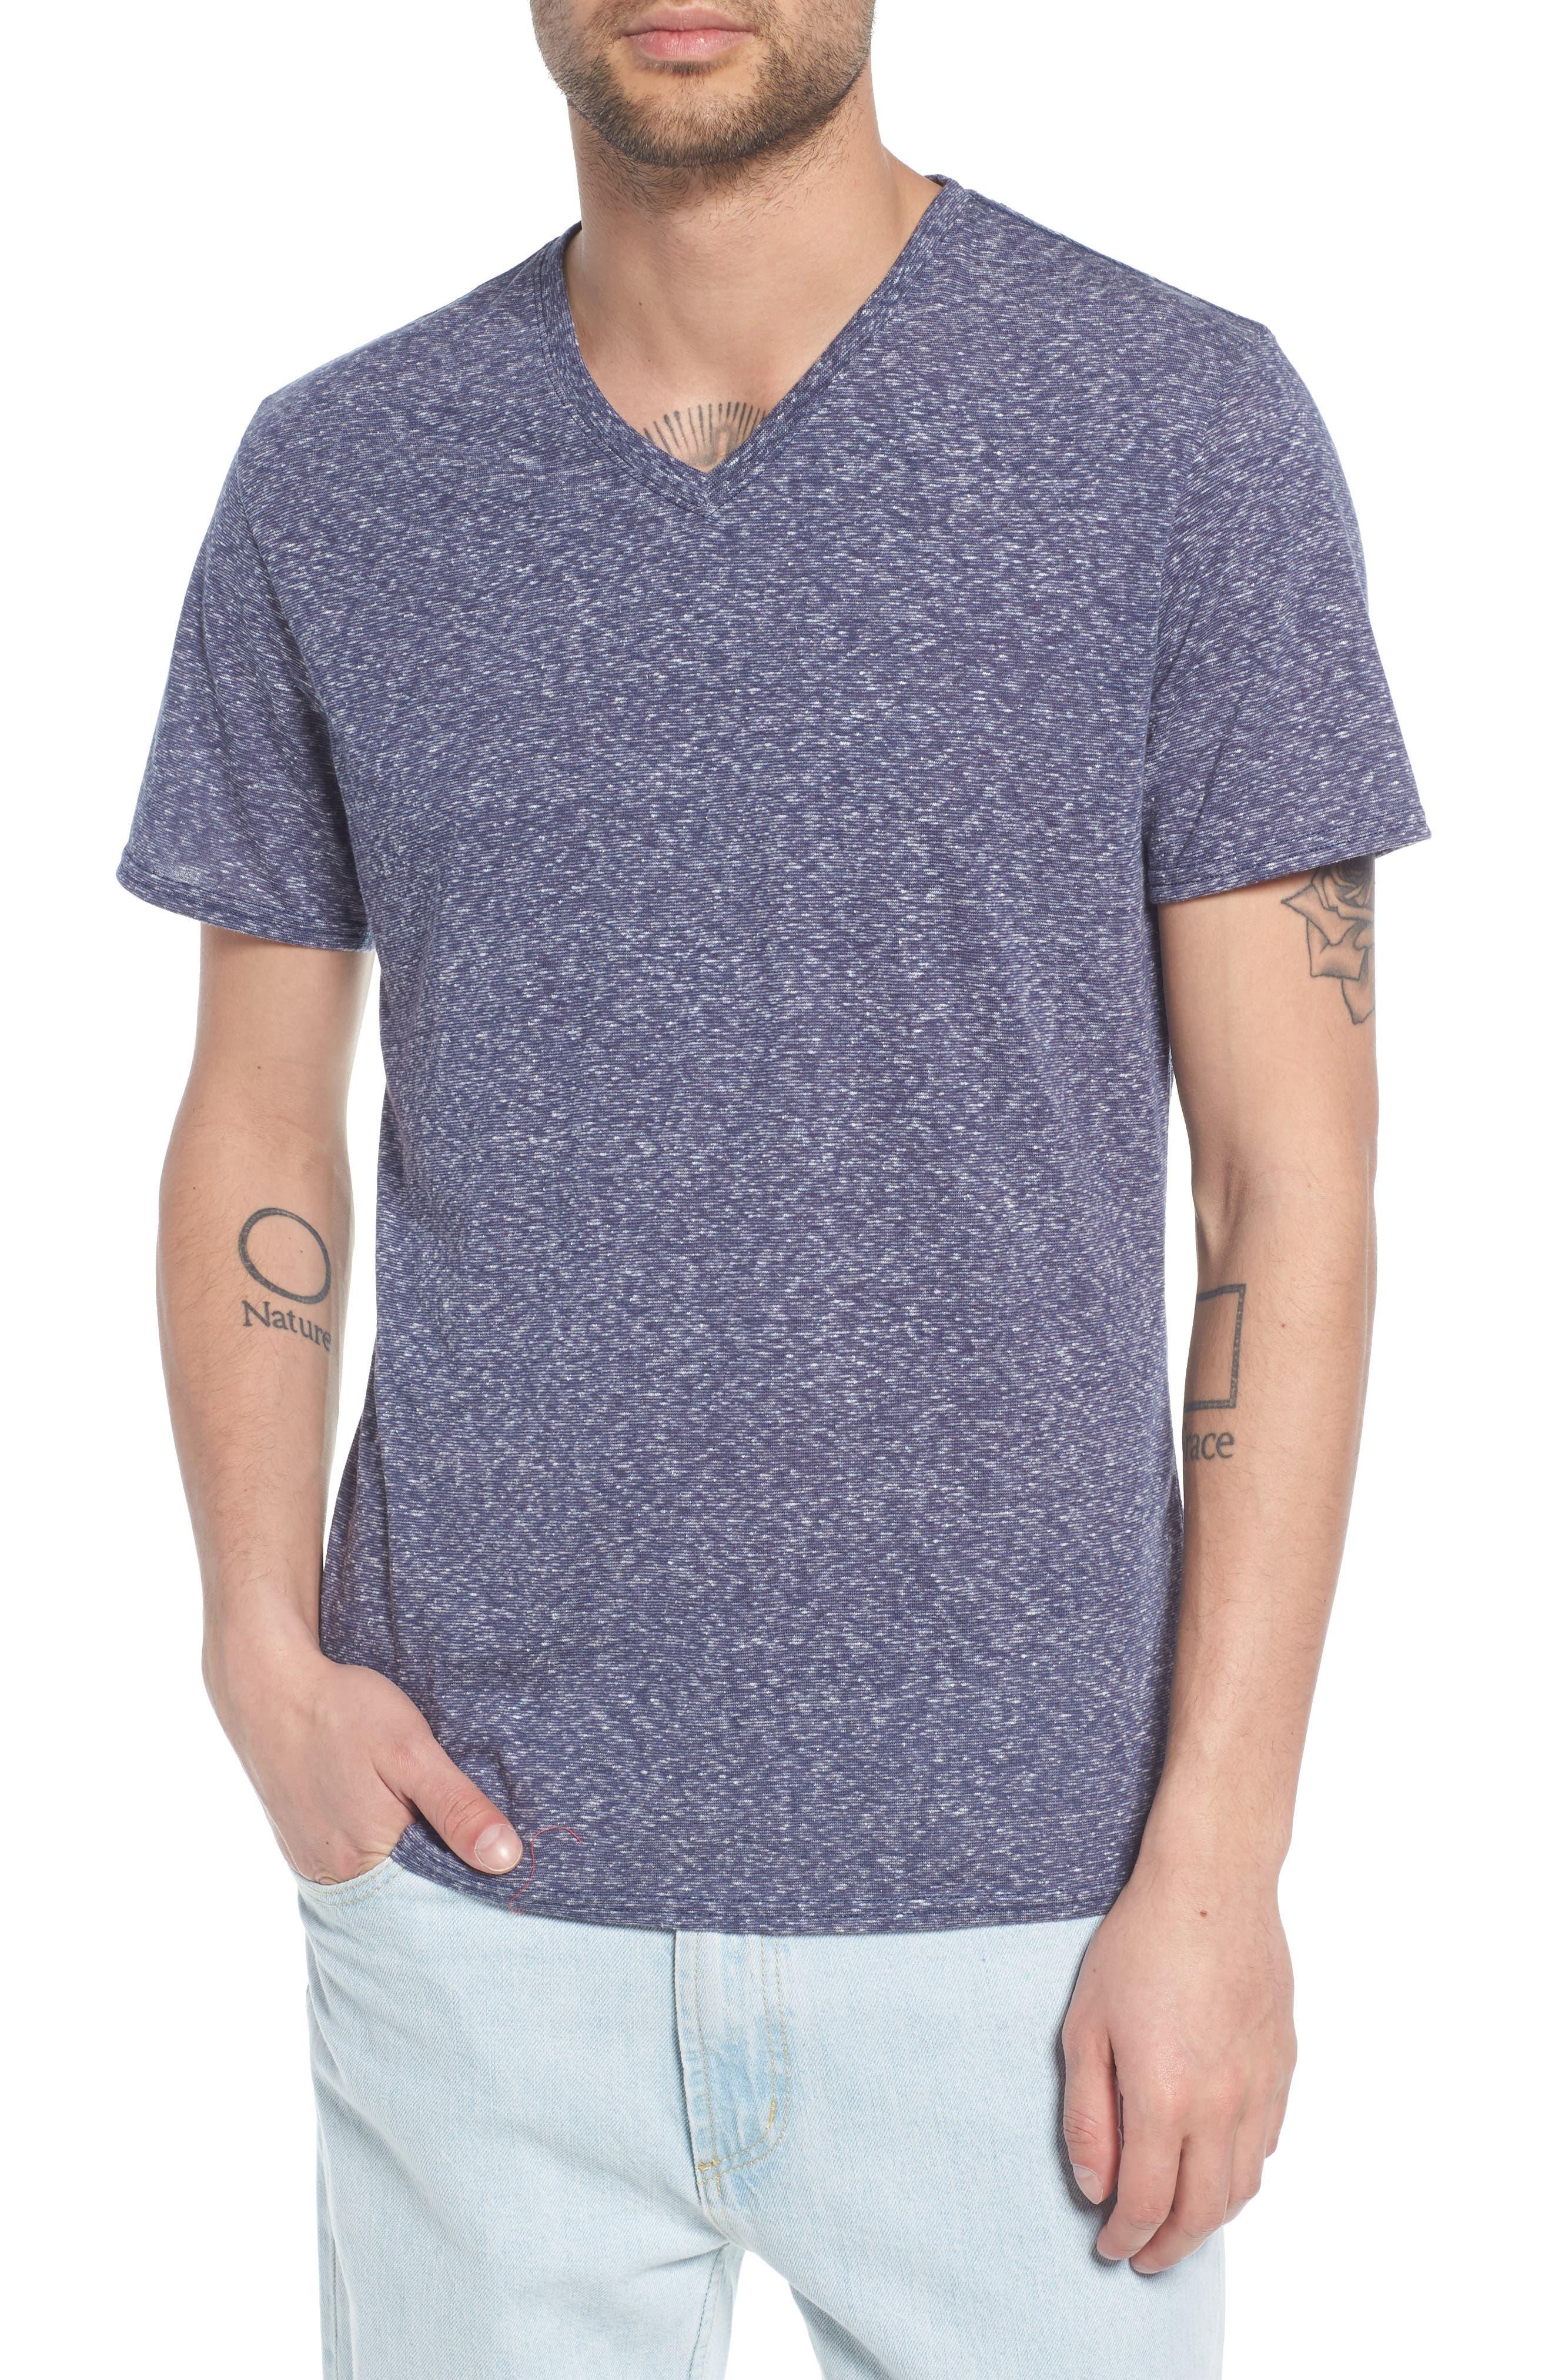 Jersey V-Neck T-Shirt,                             Main thumbnail 1, color,                             410